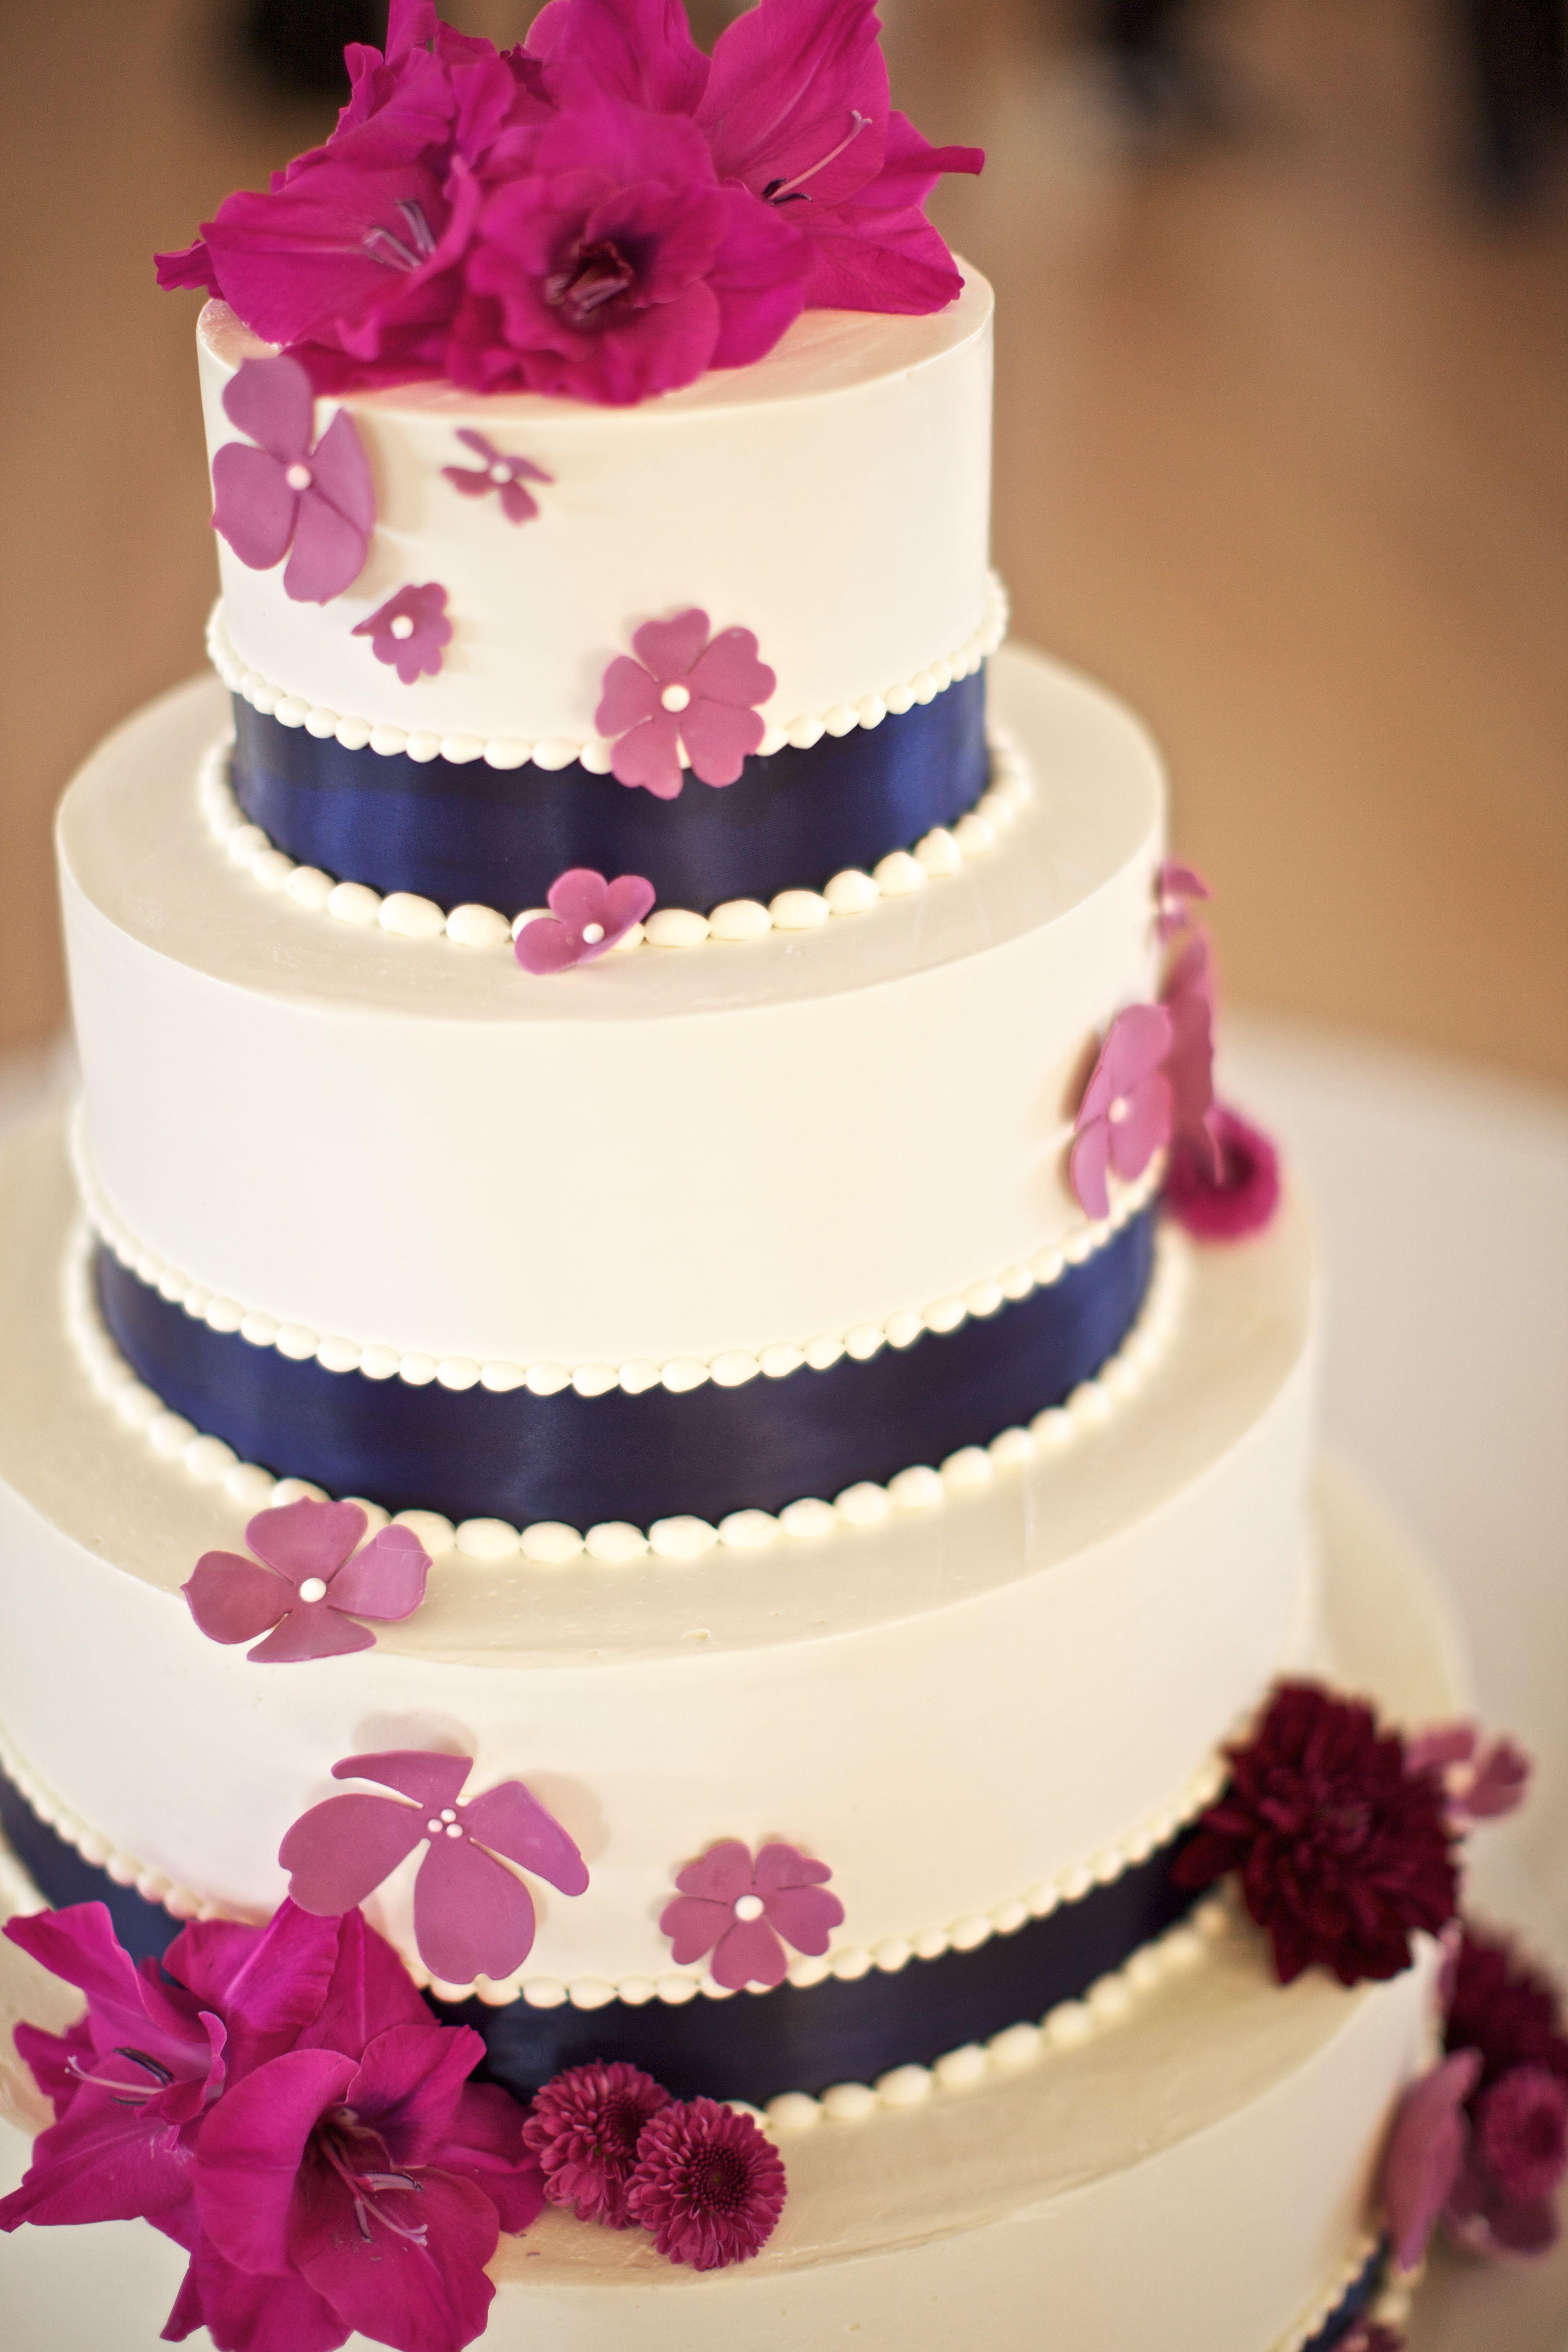 Gâteau De Mariage Bleu Marine Et Rosefushia Gateau